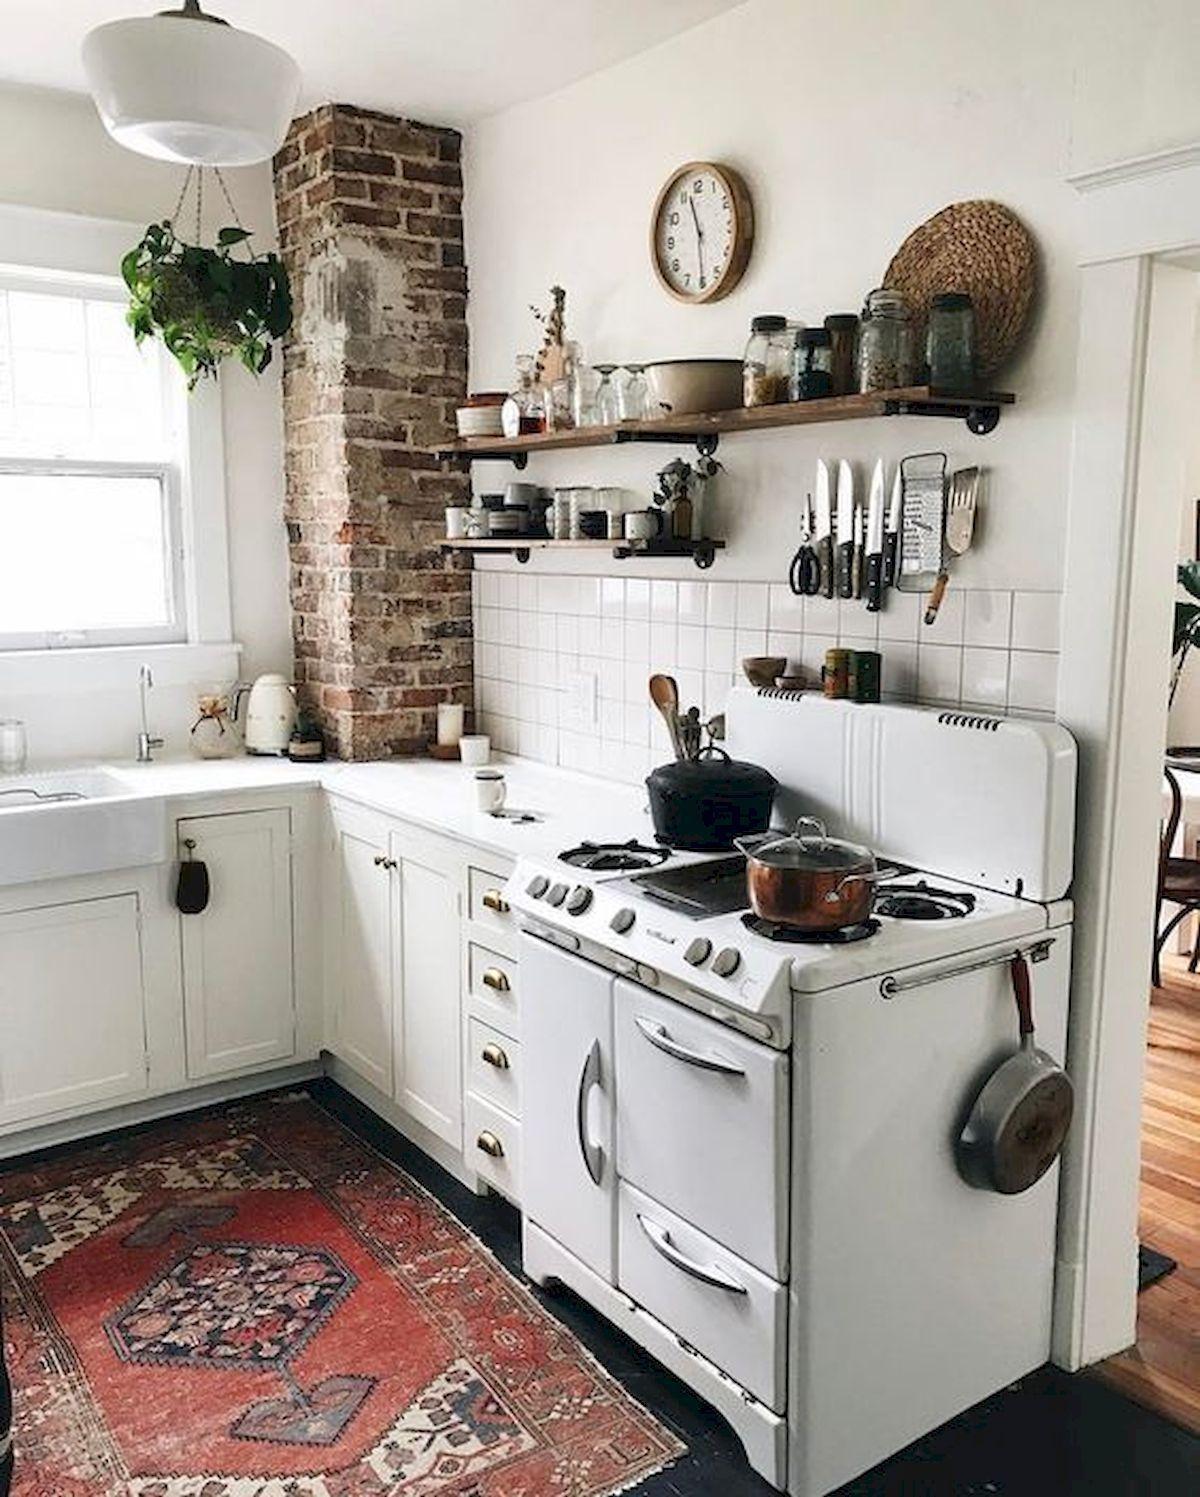 50 Best Small Kitchen Design Ideas And Decor (40 #smallkitchendecor